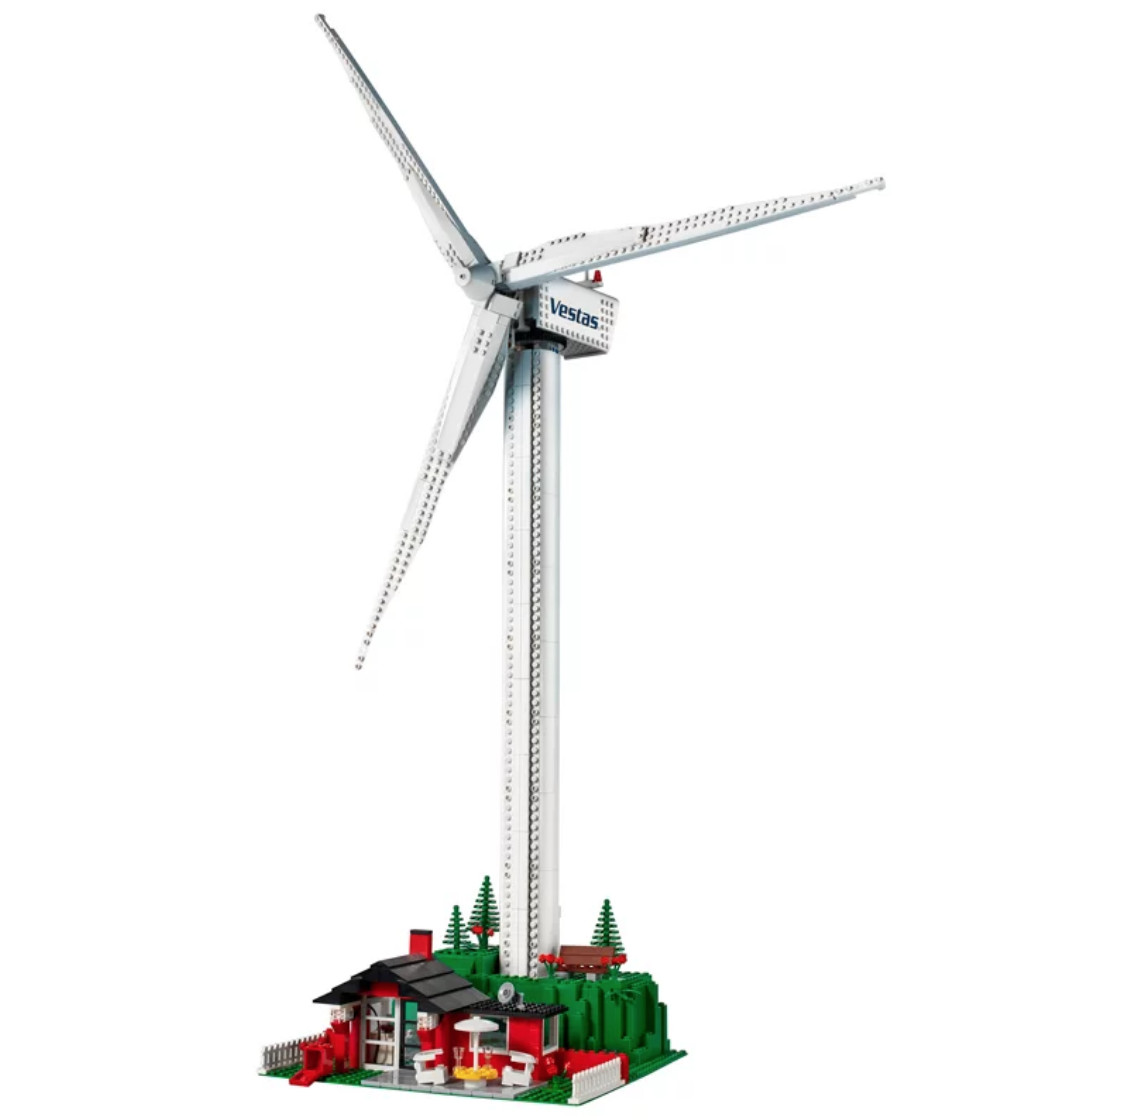 Lego wind turbine with cottage underneath